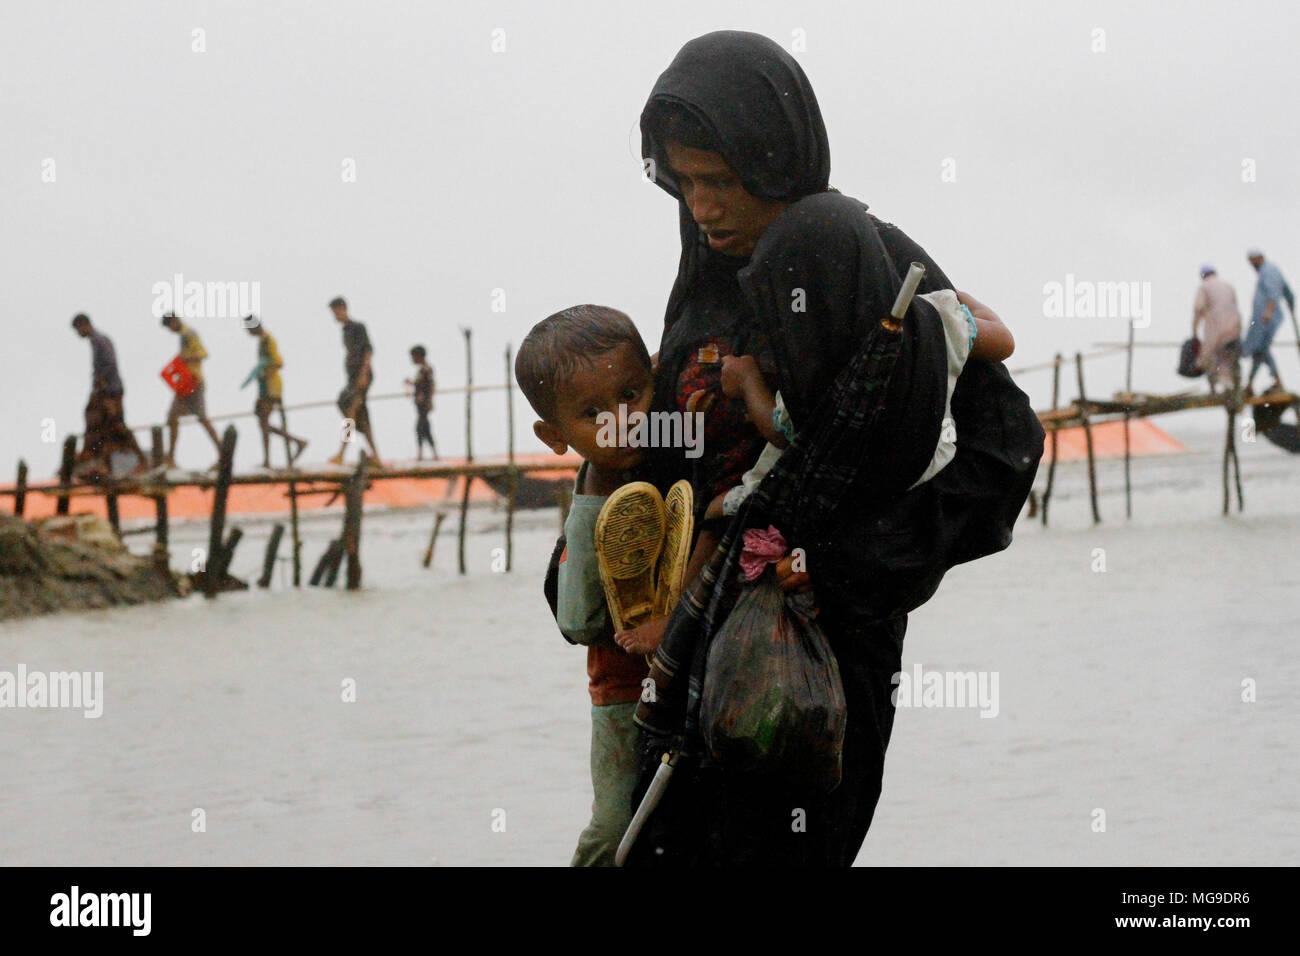 Bangladesh: Rohingya refugees fleeing military operation in Myanmar's Rakhine state, entered Bangladesh territory to take shelter in Cox's Bazar, Bang - Stock Image